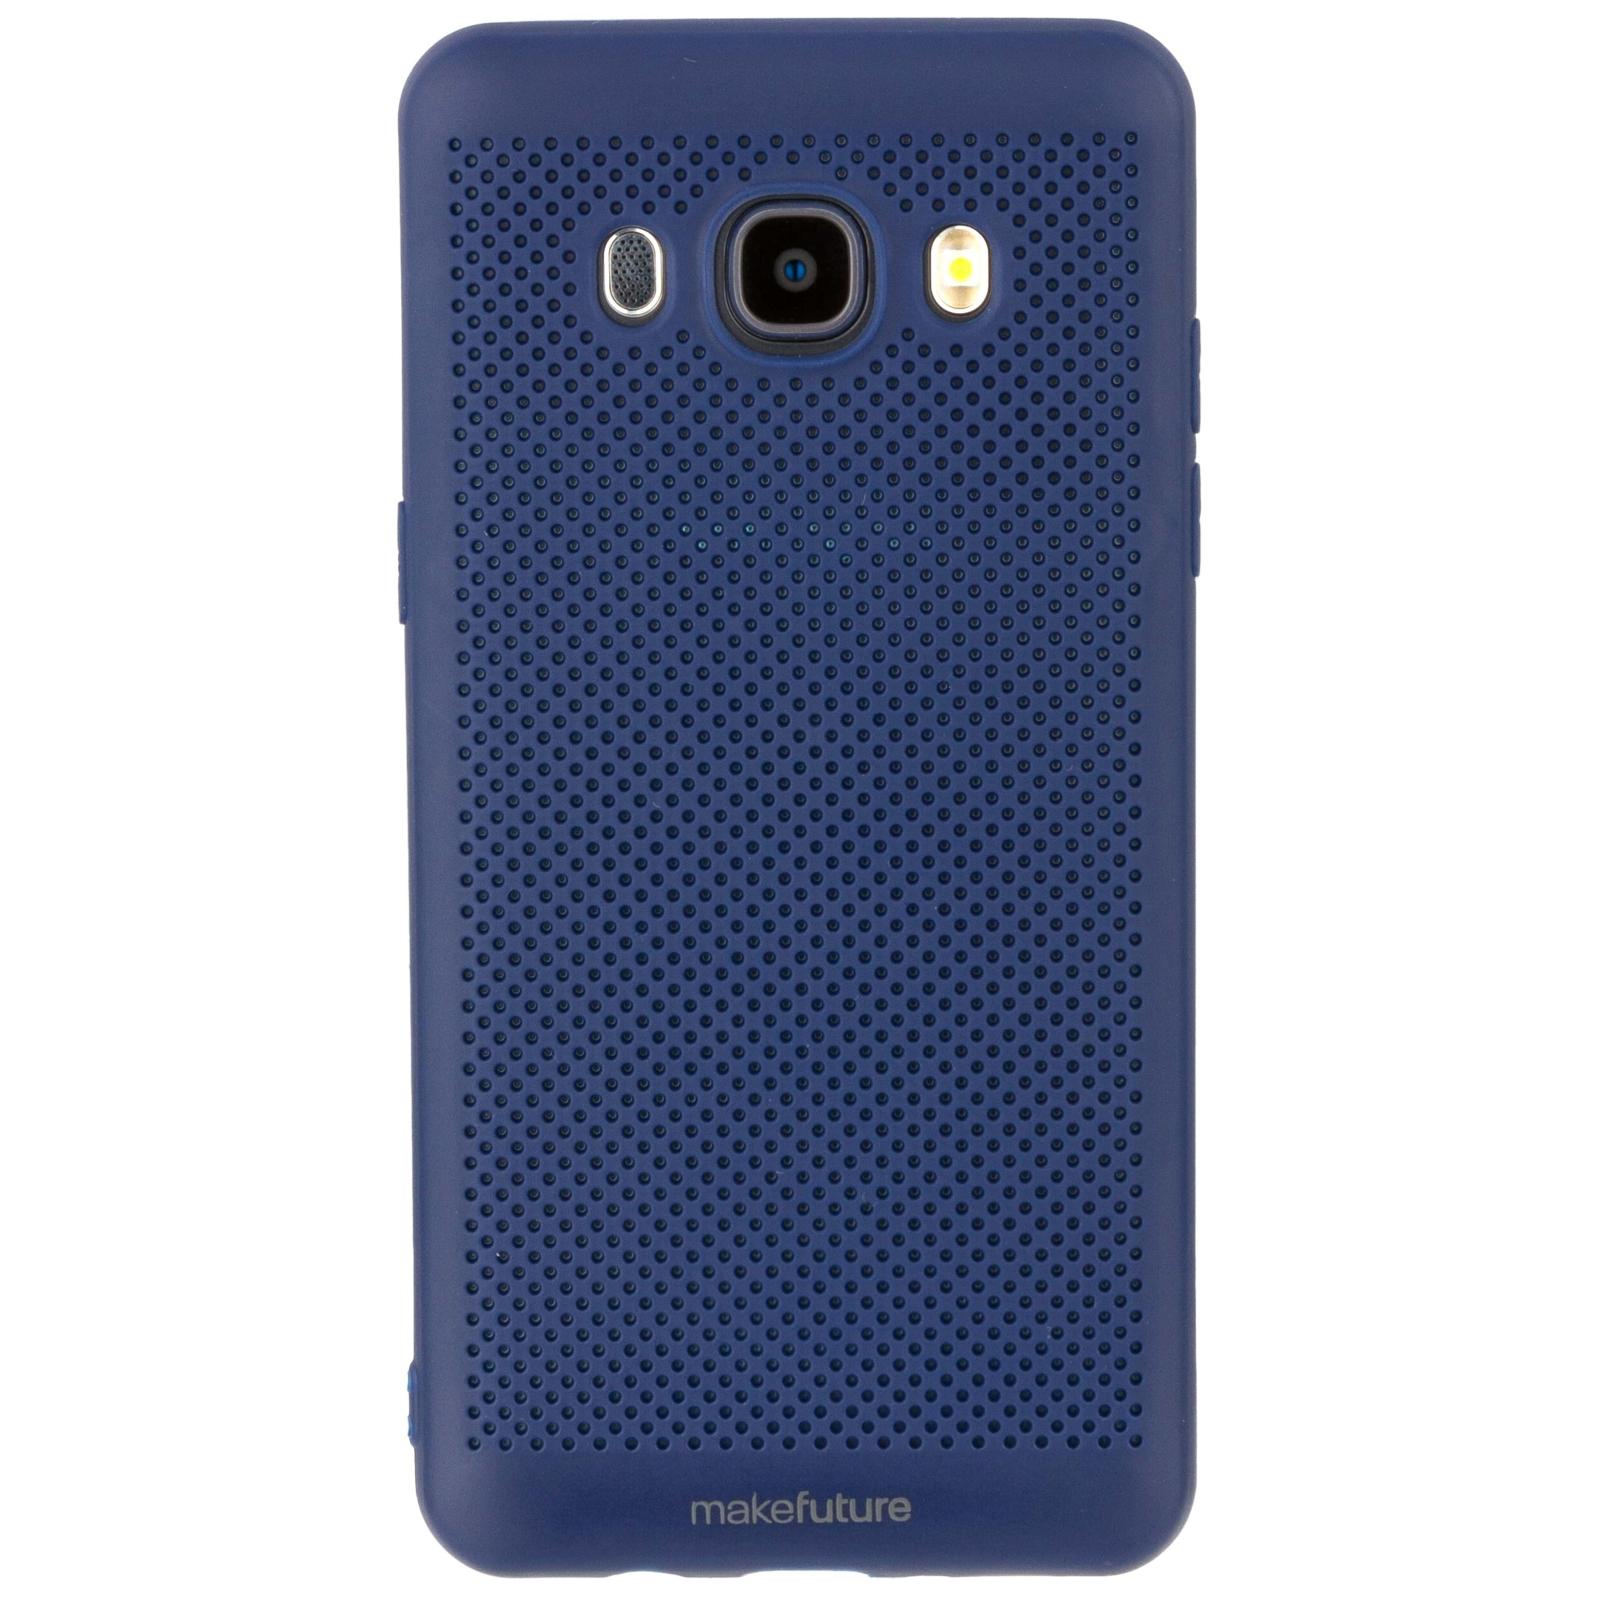 Чехол для моб. телефона MakeFuture Moon Case (TPU) для Samsung J5 2016 (J510) Blue (MCM-SJ510BL)